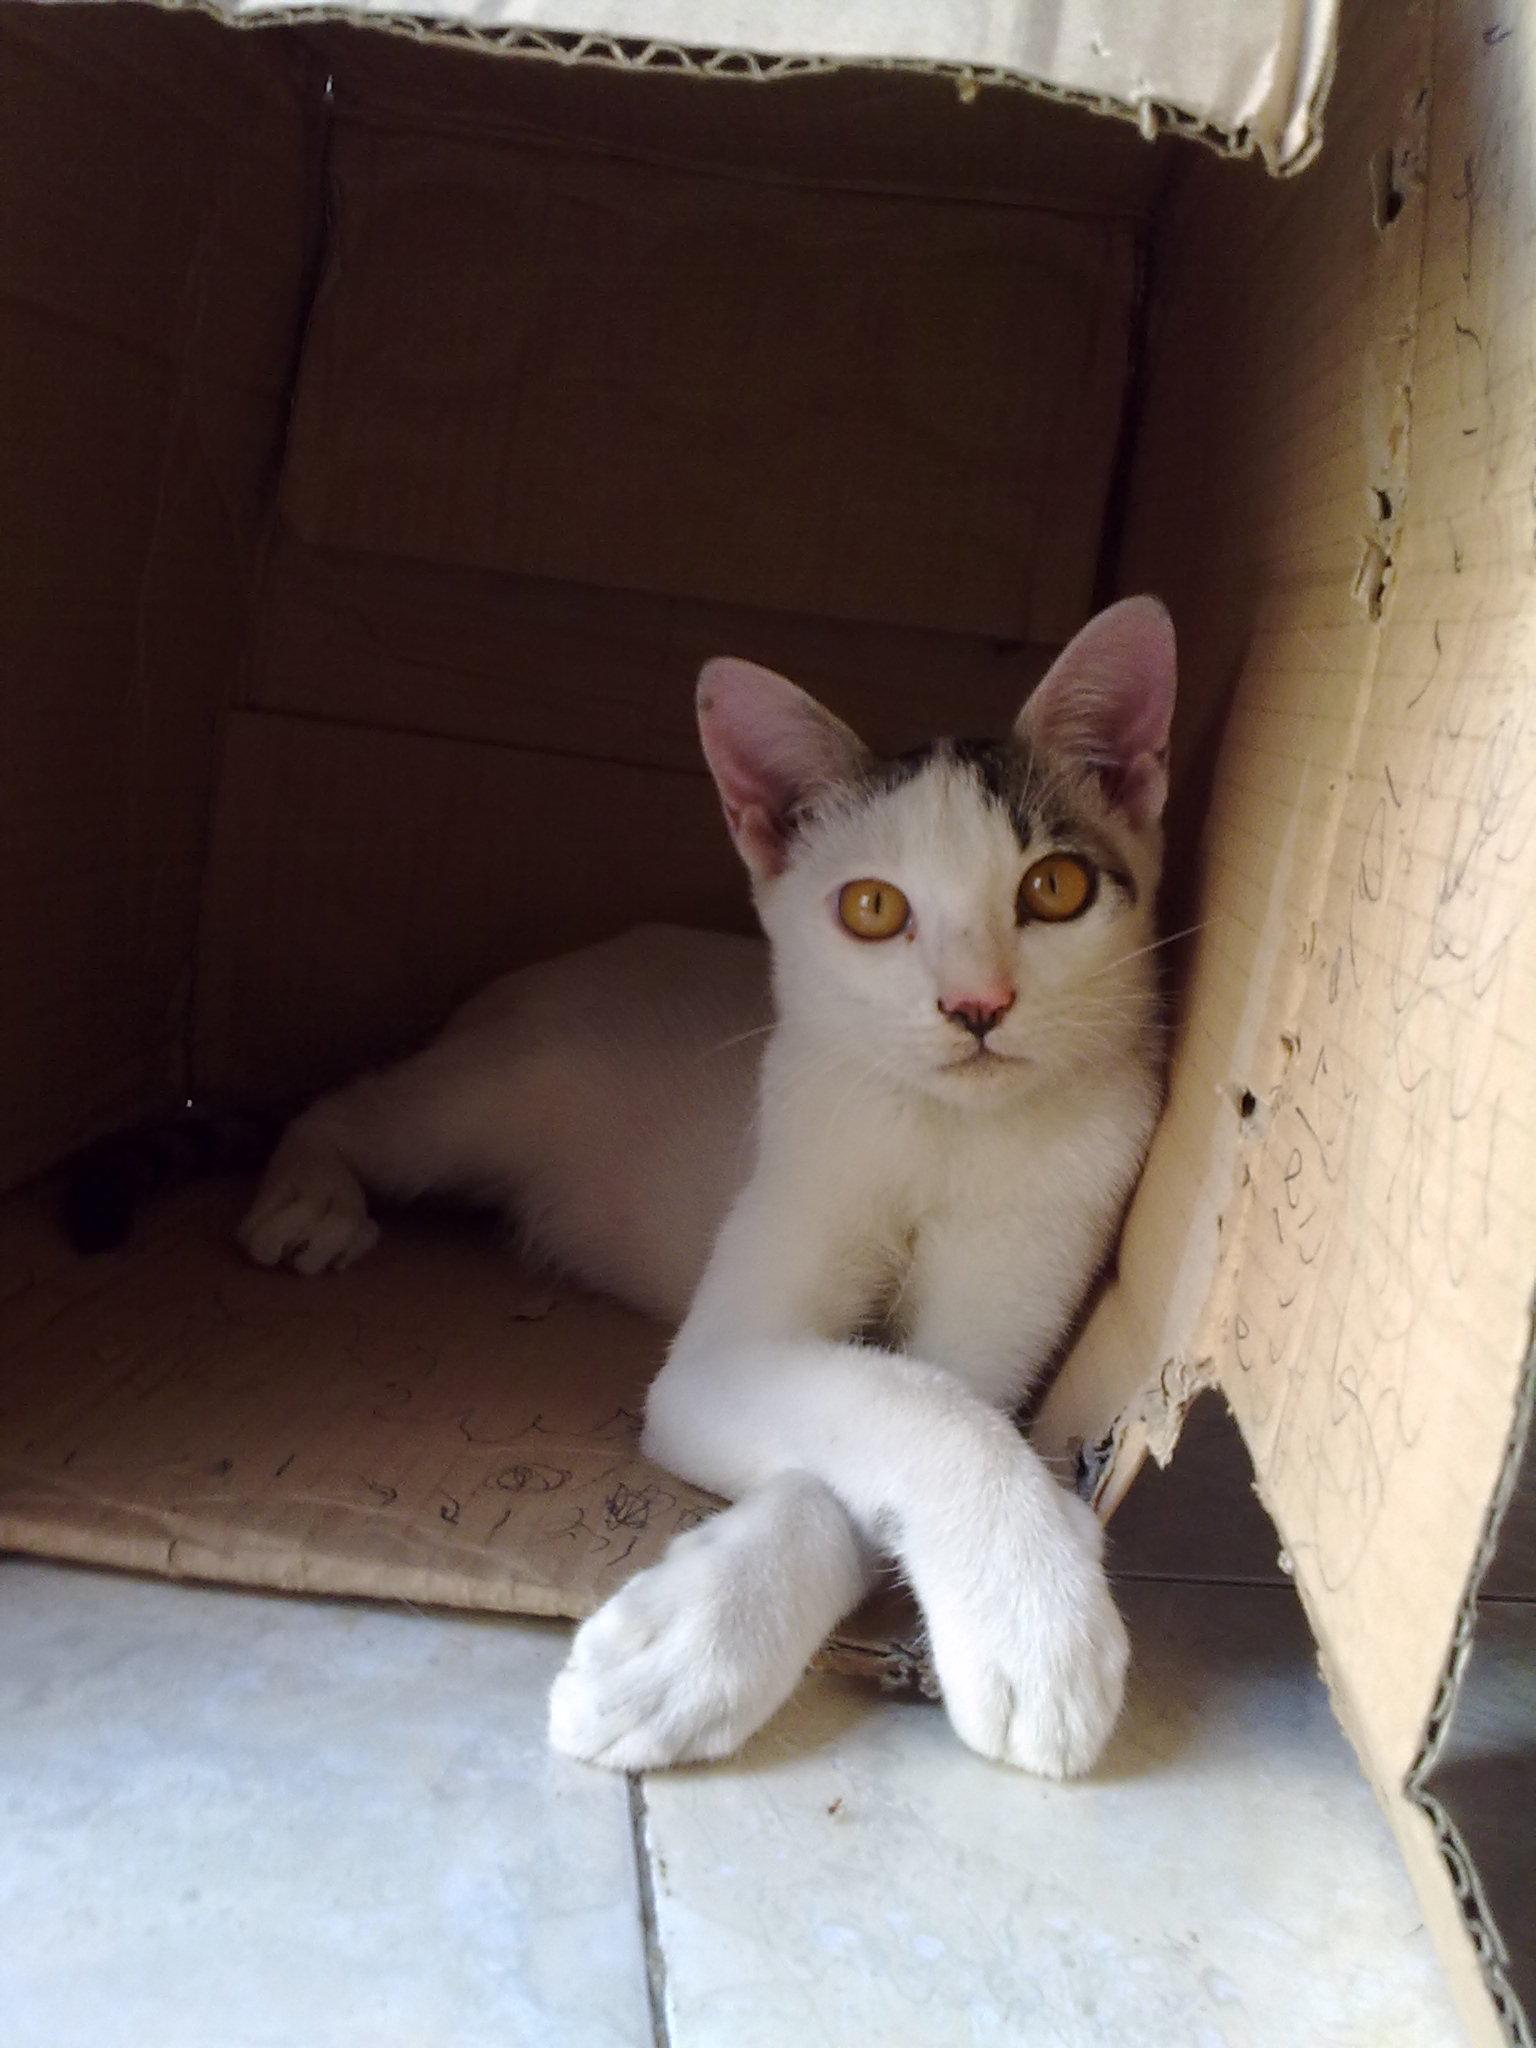 Cat in the box photo